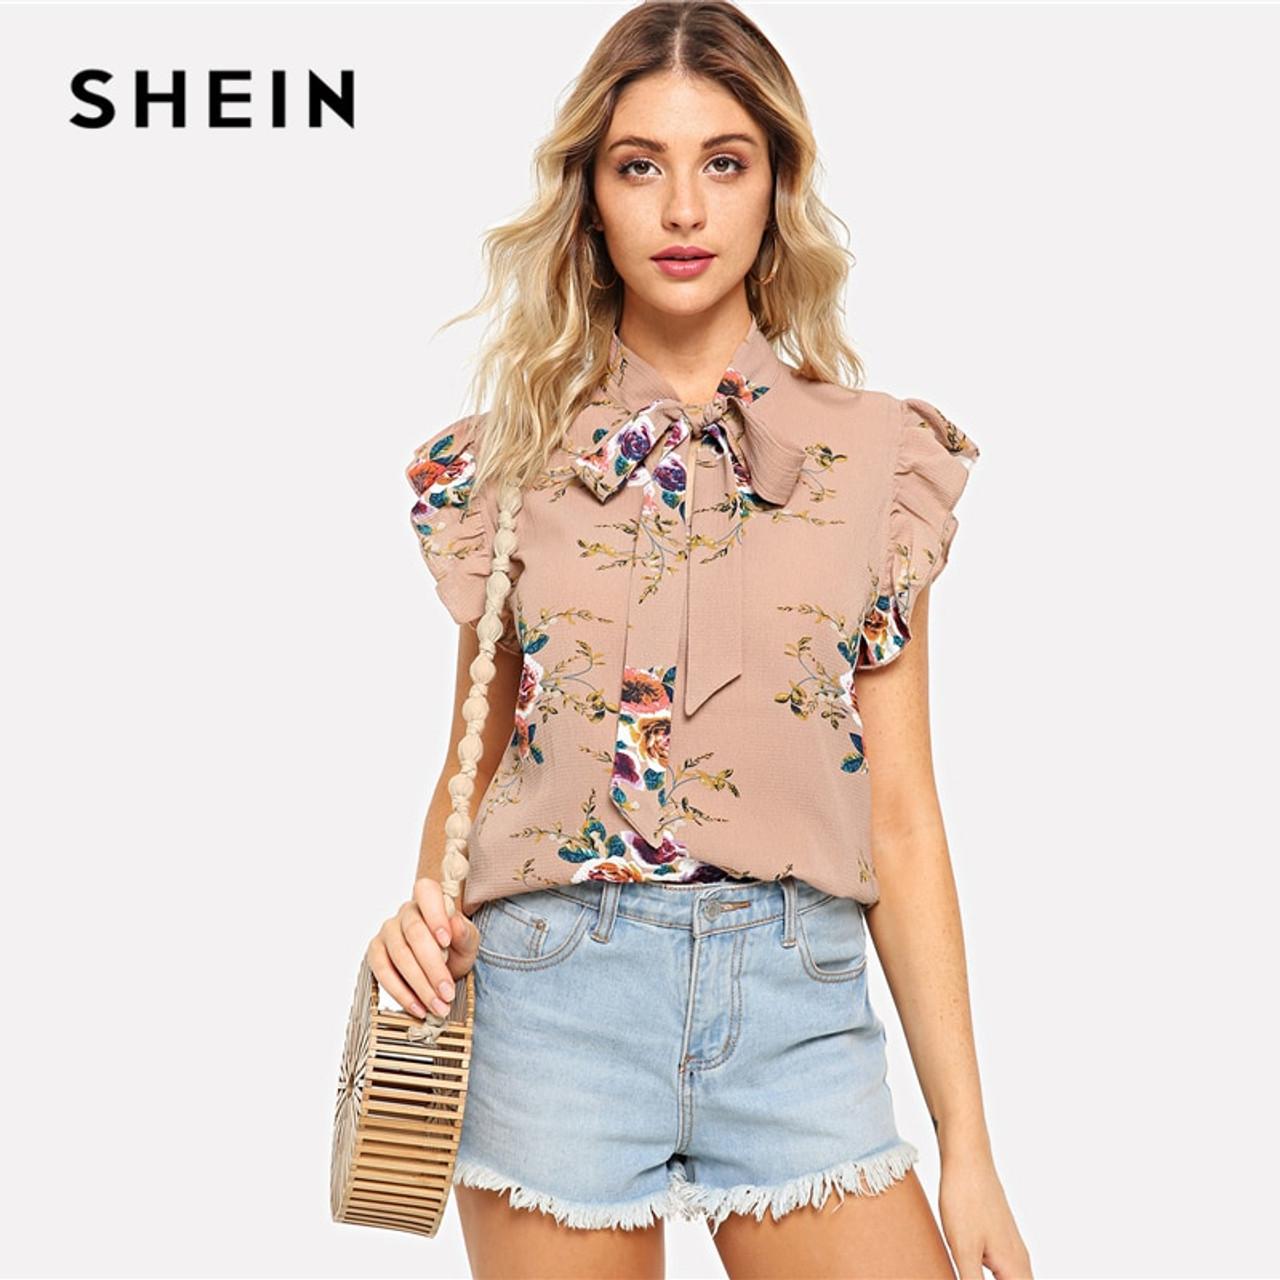 14d1b5ccfb40d3 ... SHEIN Flounce Shoulder Tied Neck Floral Blouse Pink Ruffle Sleeveless  Chiffon Blouses Women Summer Casual Elegant ...